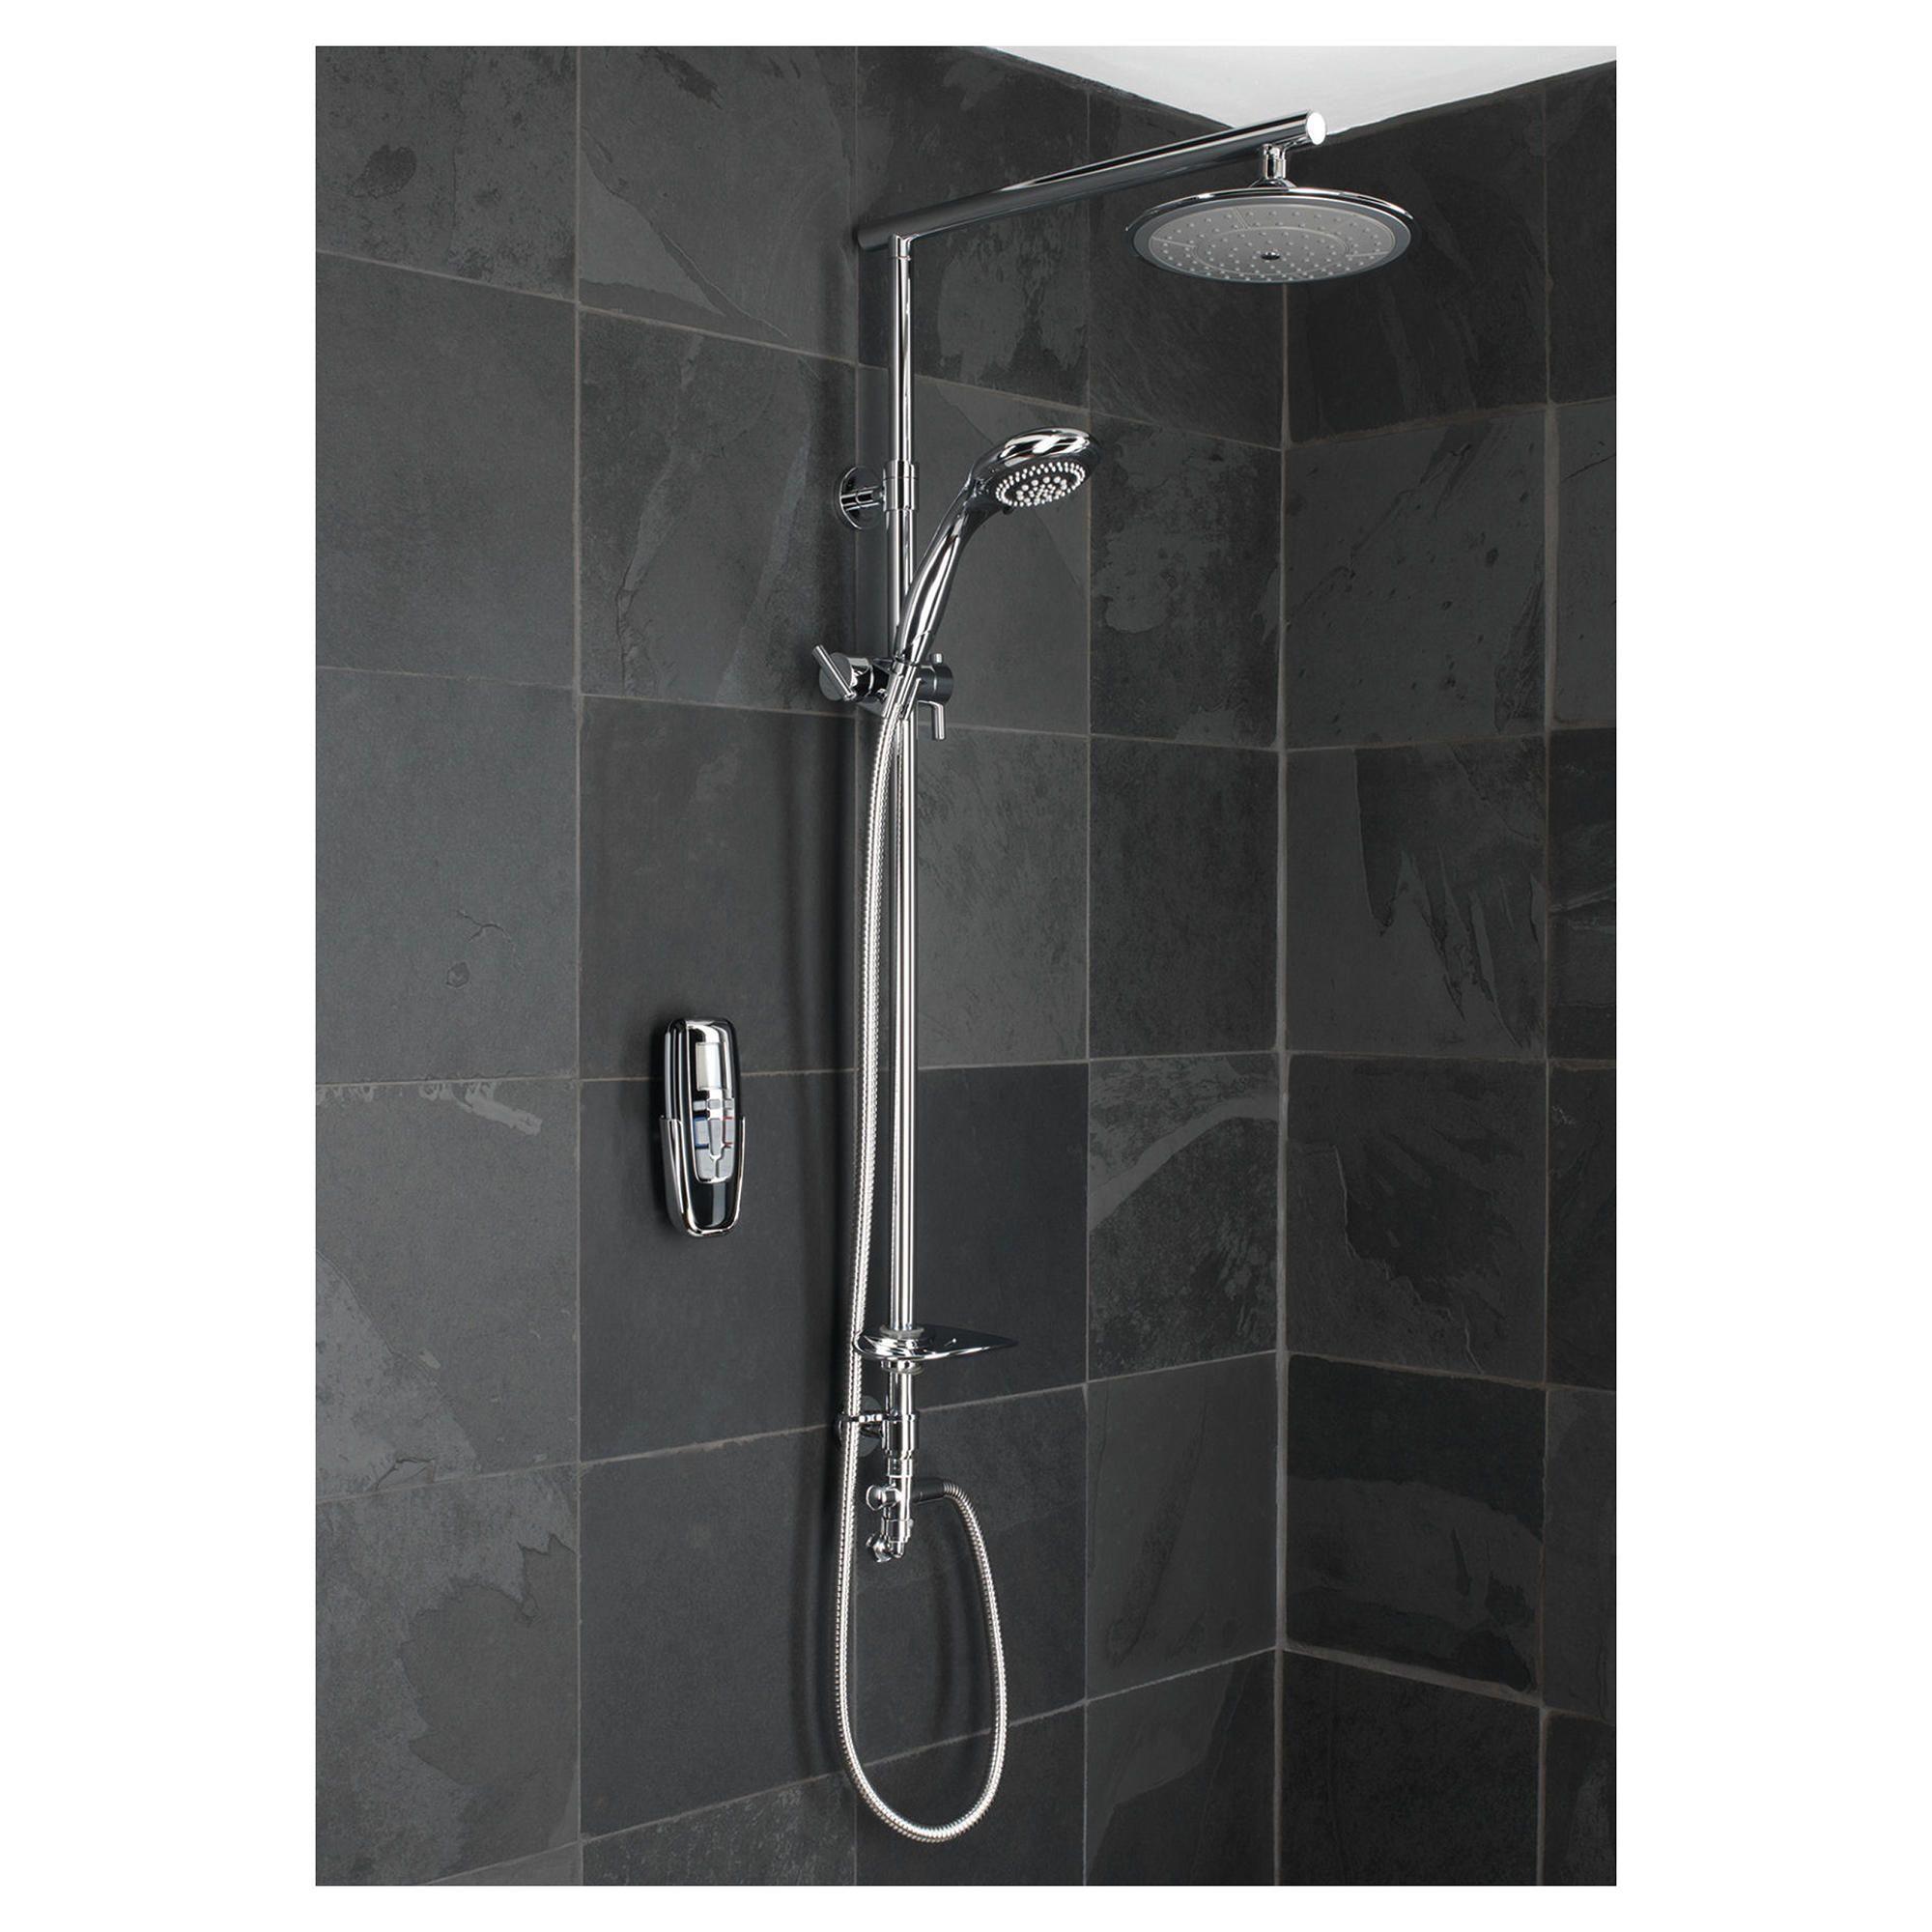 Creda Portia Shower Accessory Kit at Tesco Direct